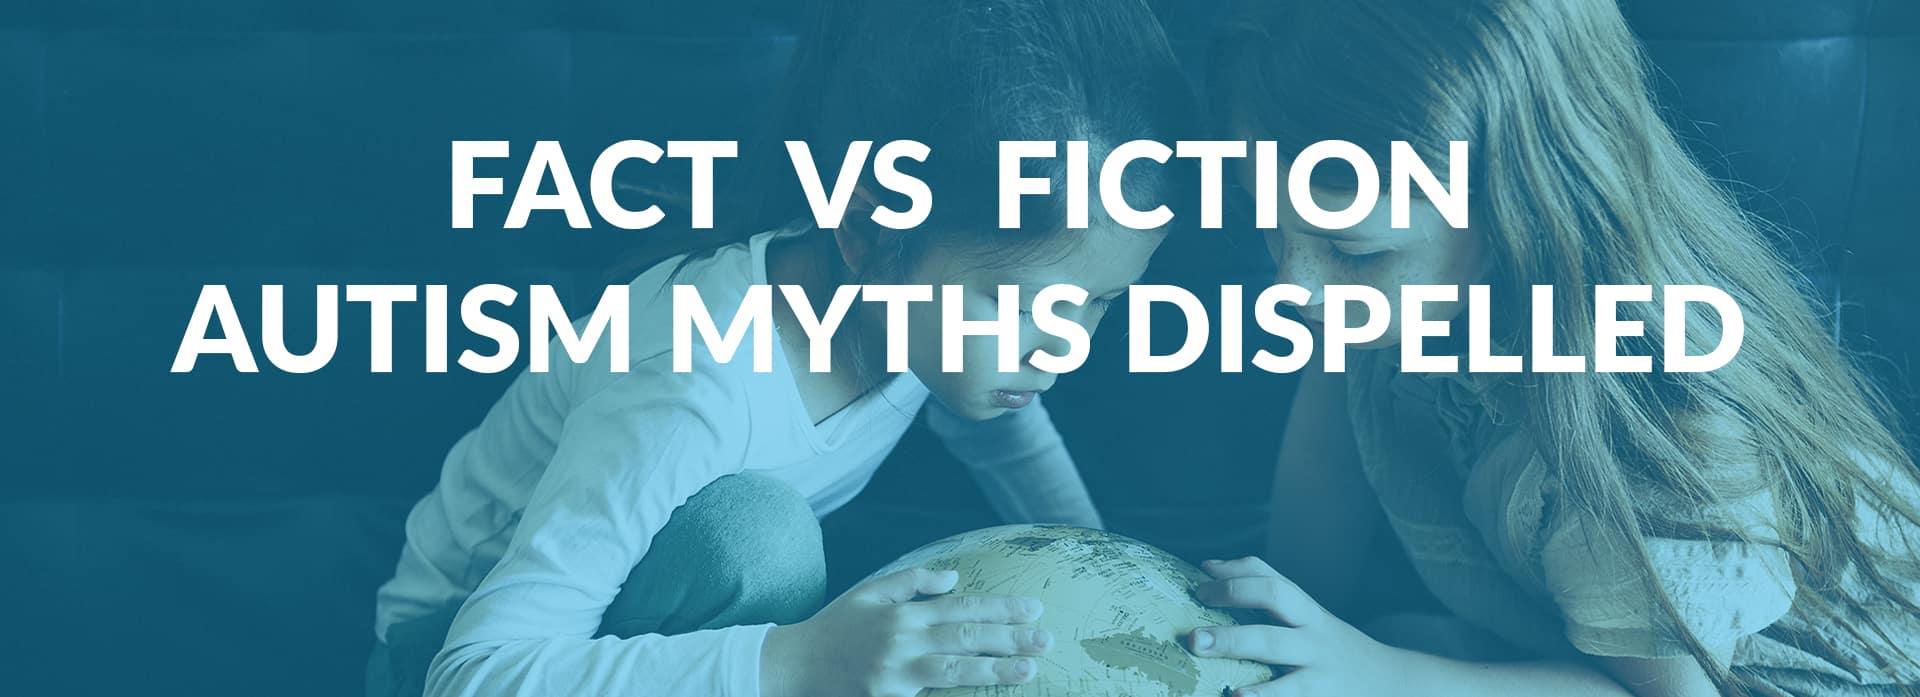 Fact Versus Fiction 6 Autism Myths Dispelled